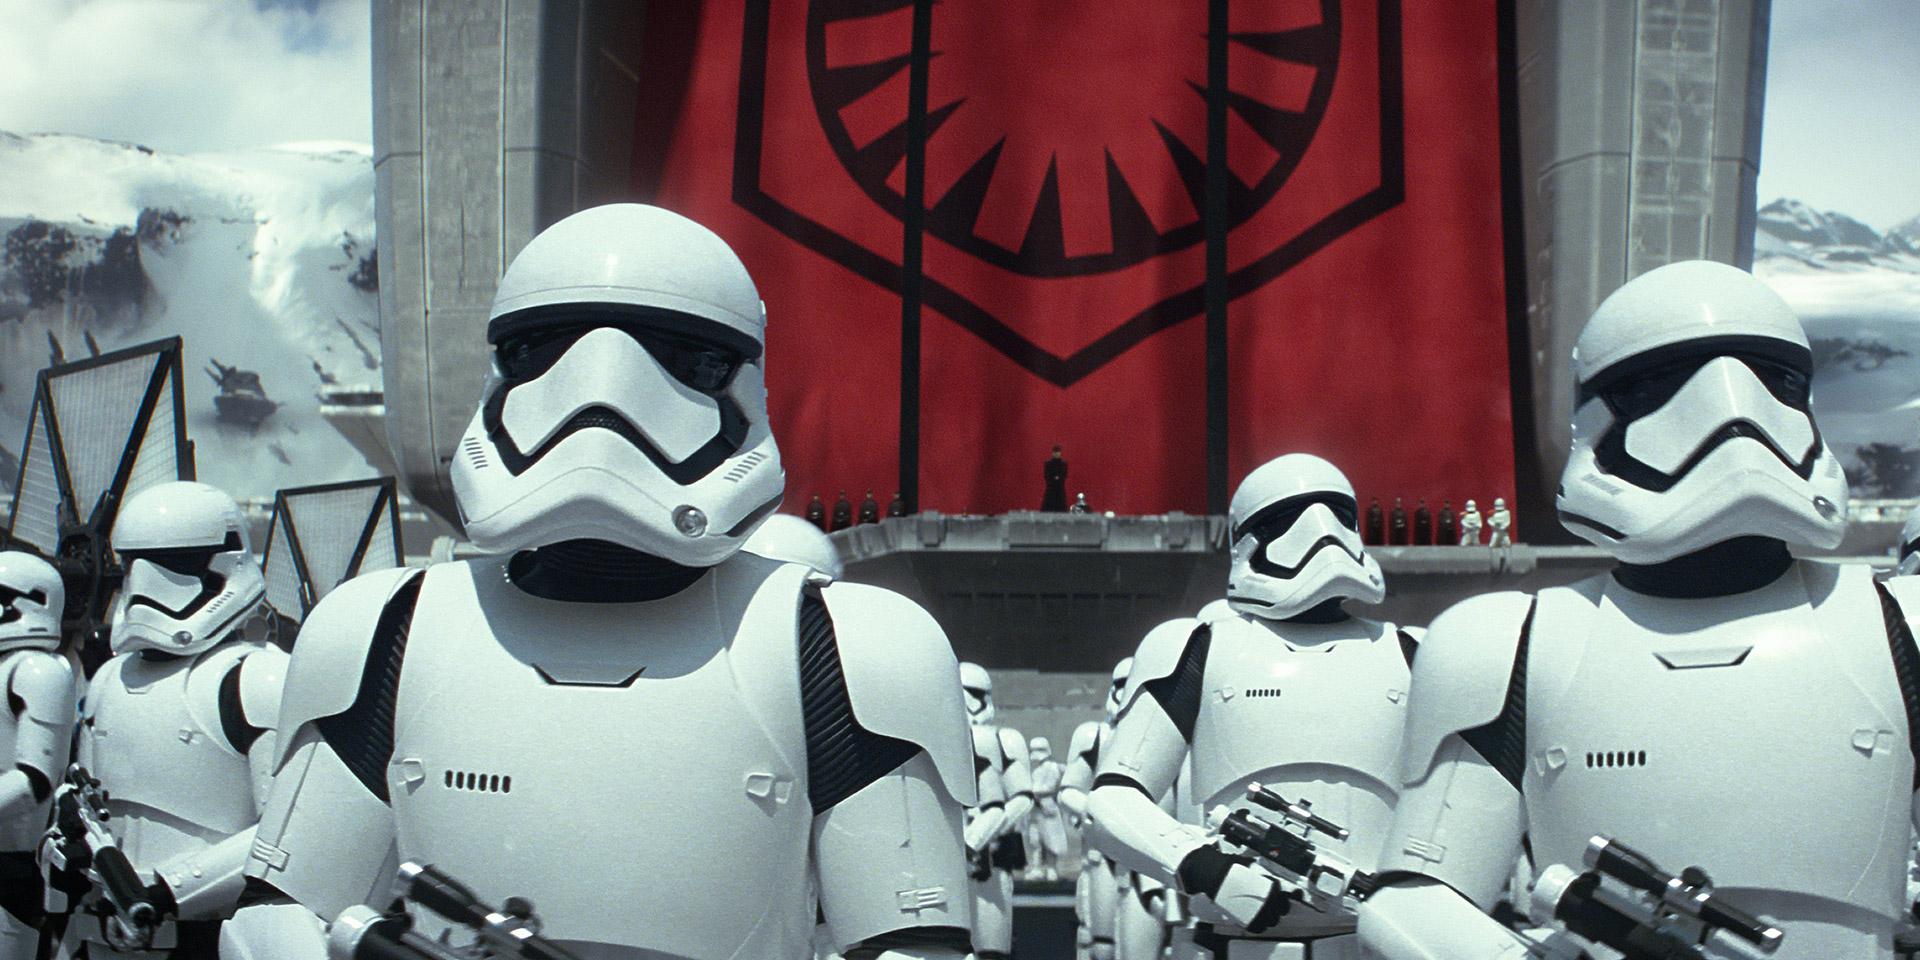 _star-wars-force-awakens